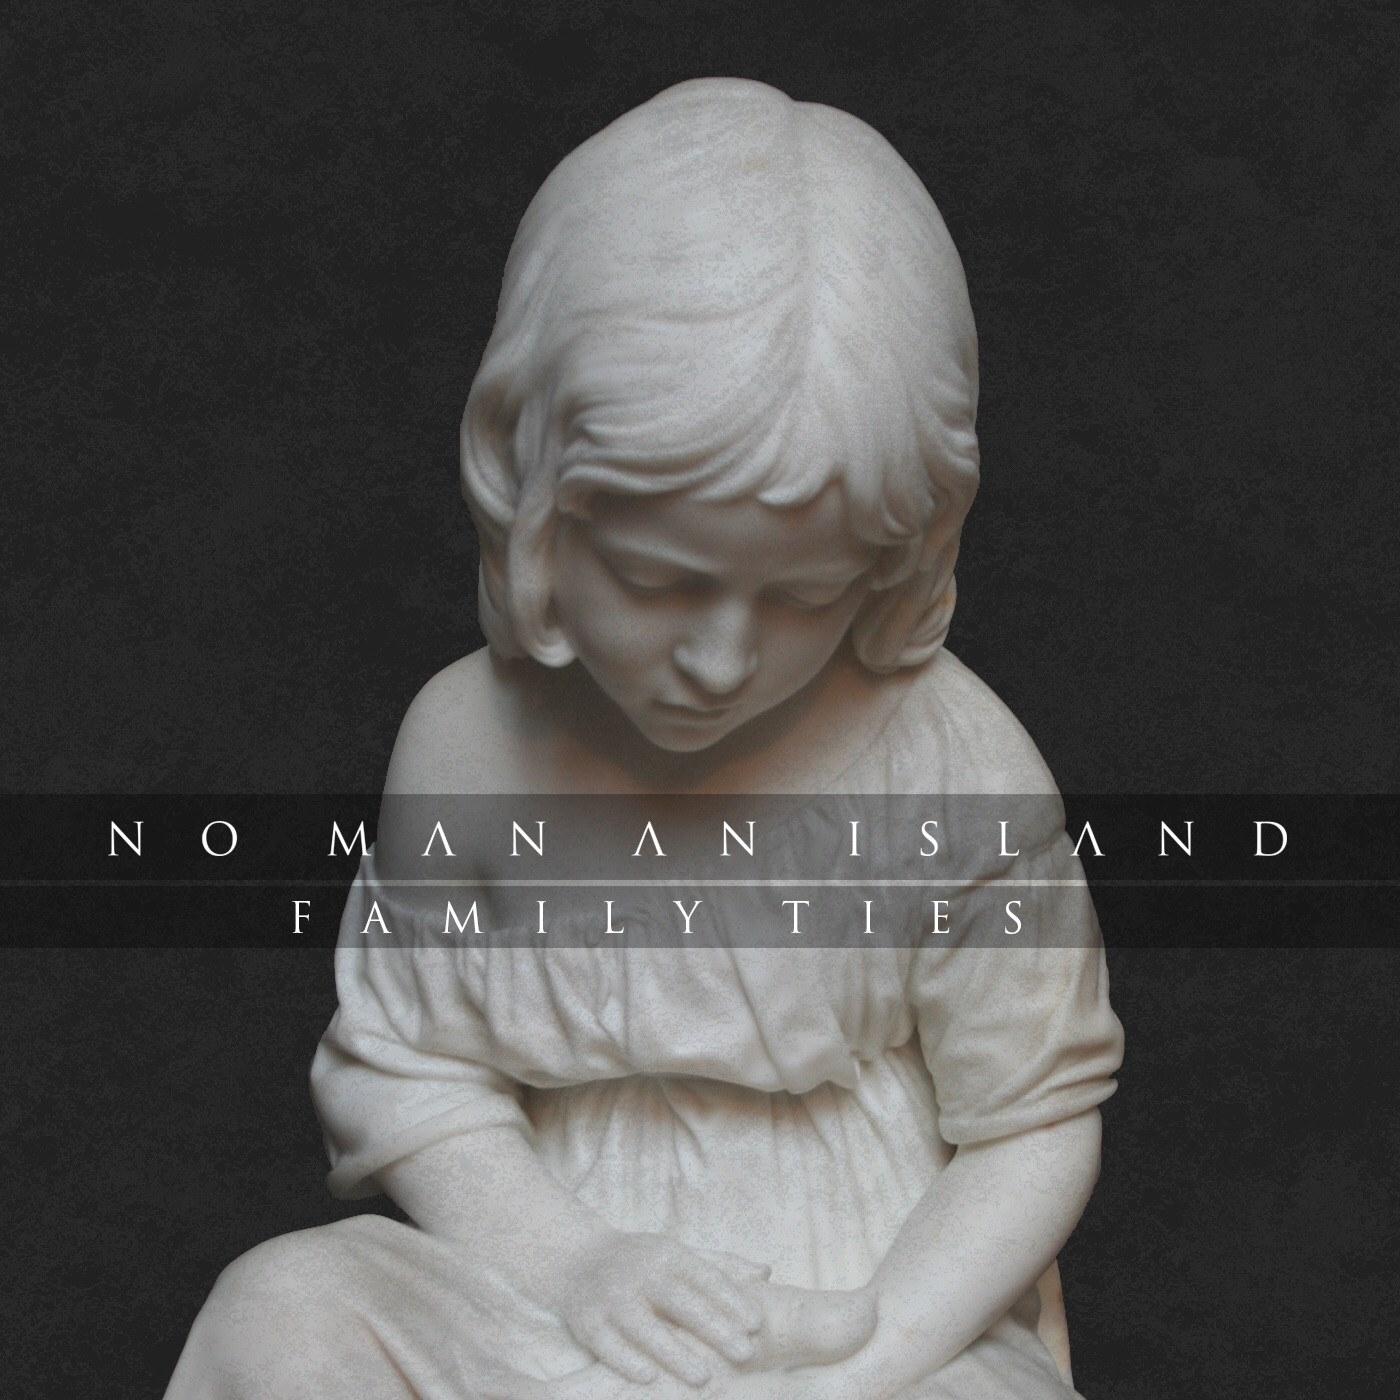 No Man An Island - Family Ties (Instrumental) [single] (2015)